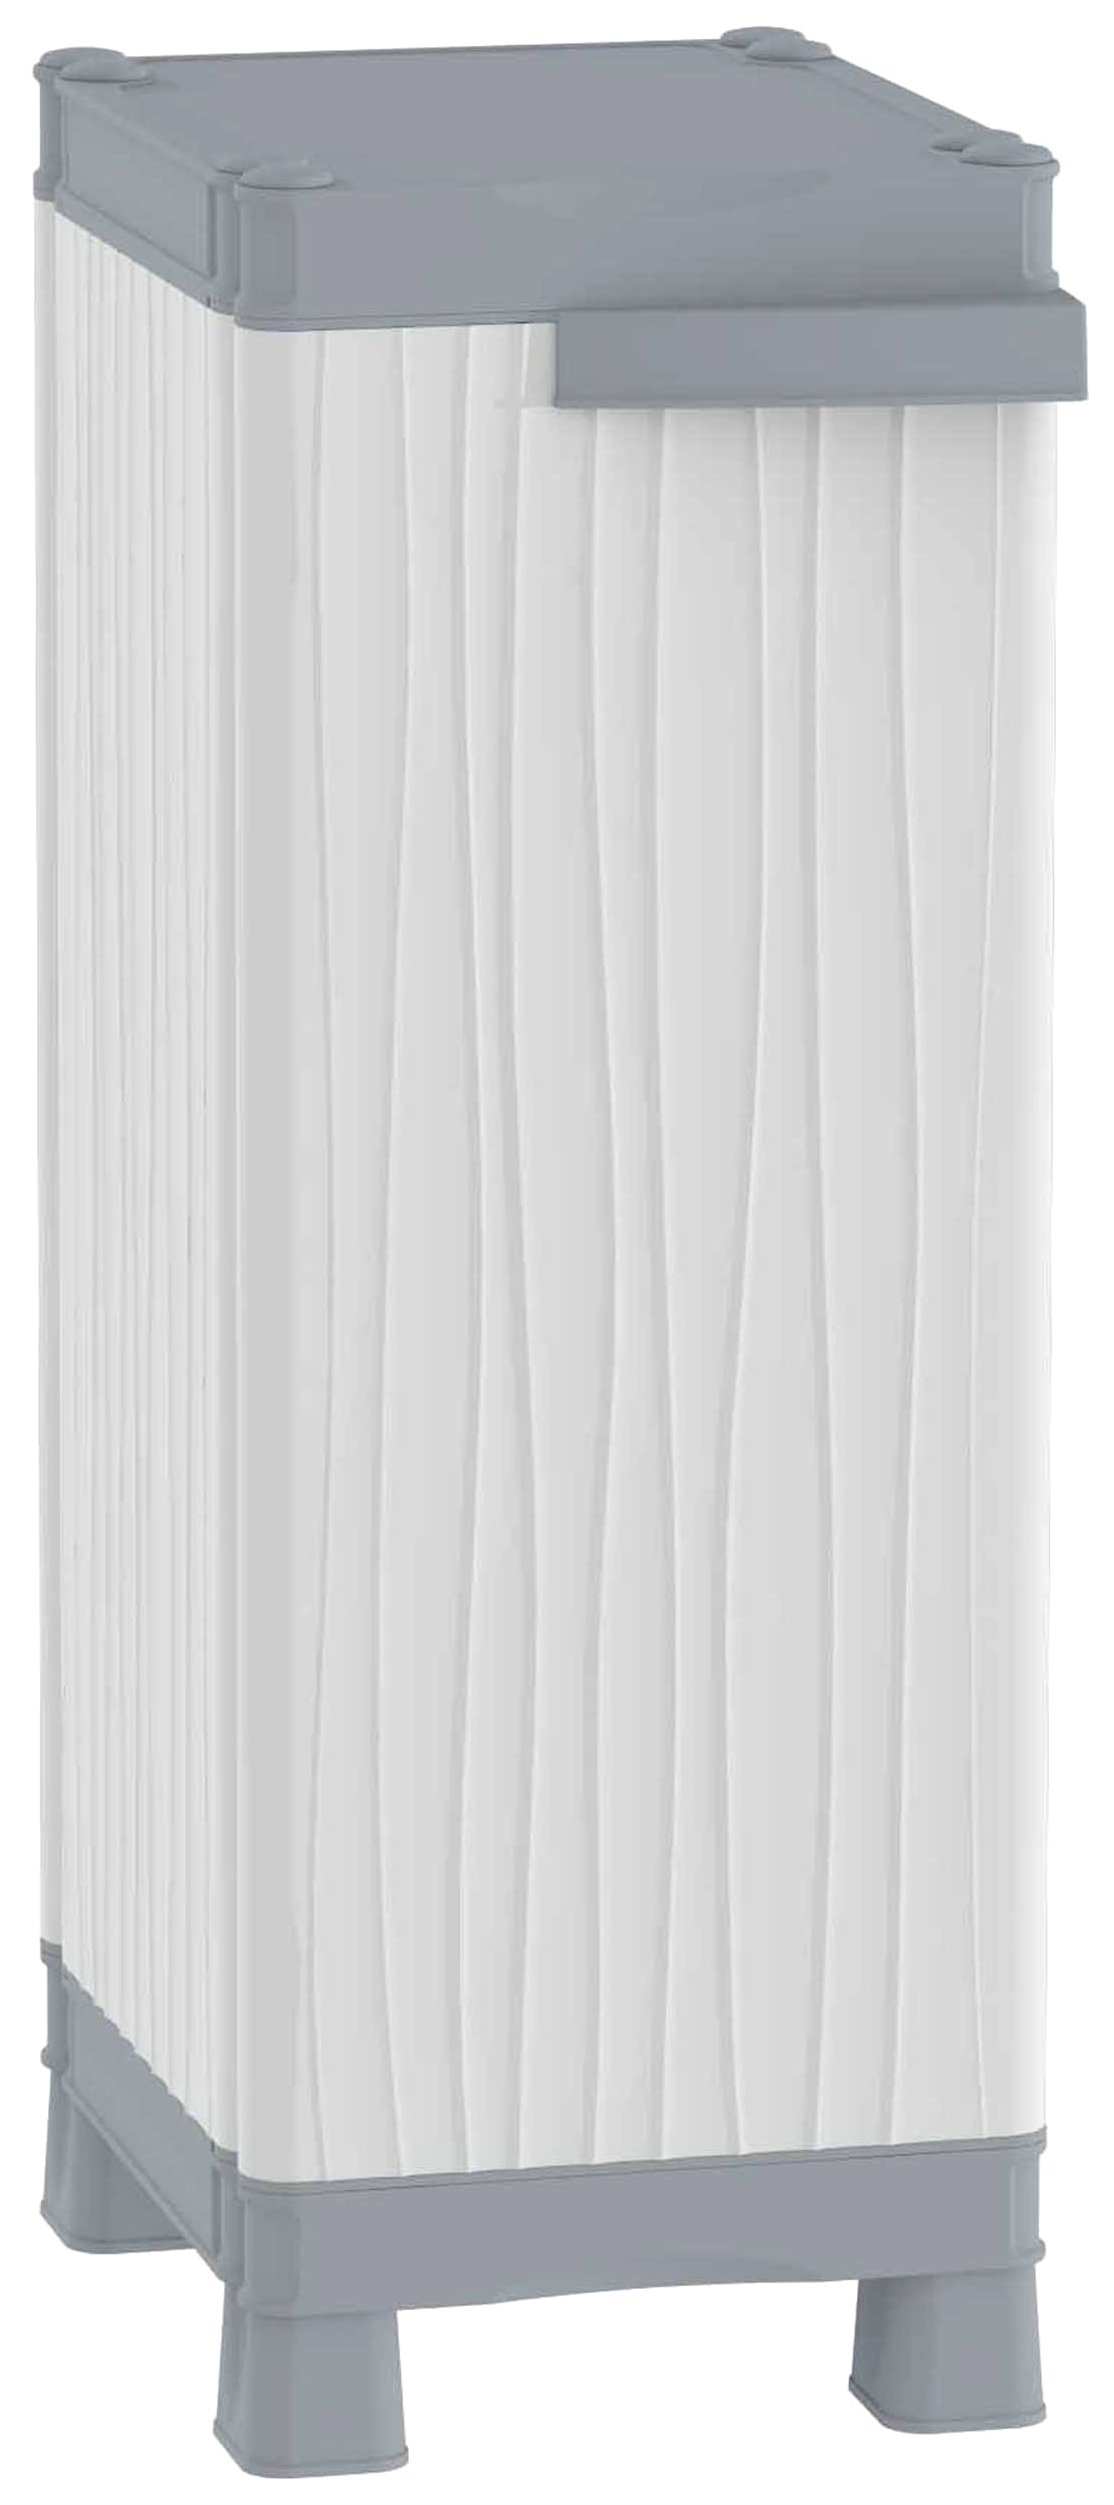 Terry - Armario plástico exterior, 35 x 43.8 x 97.6 cm product image